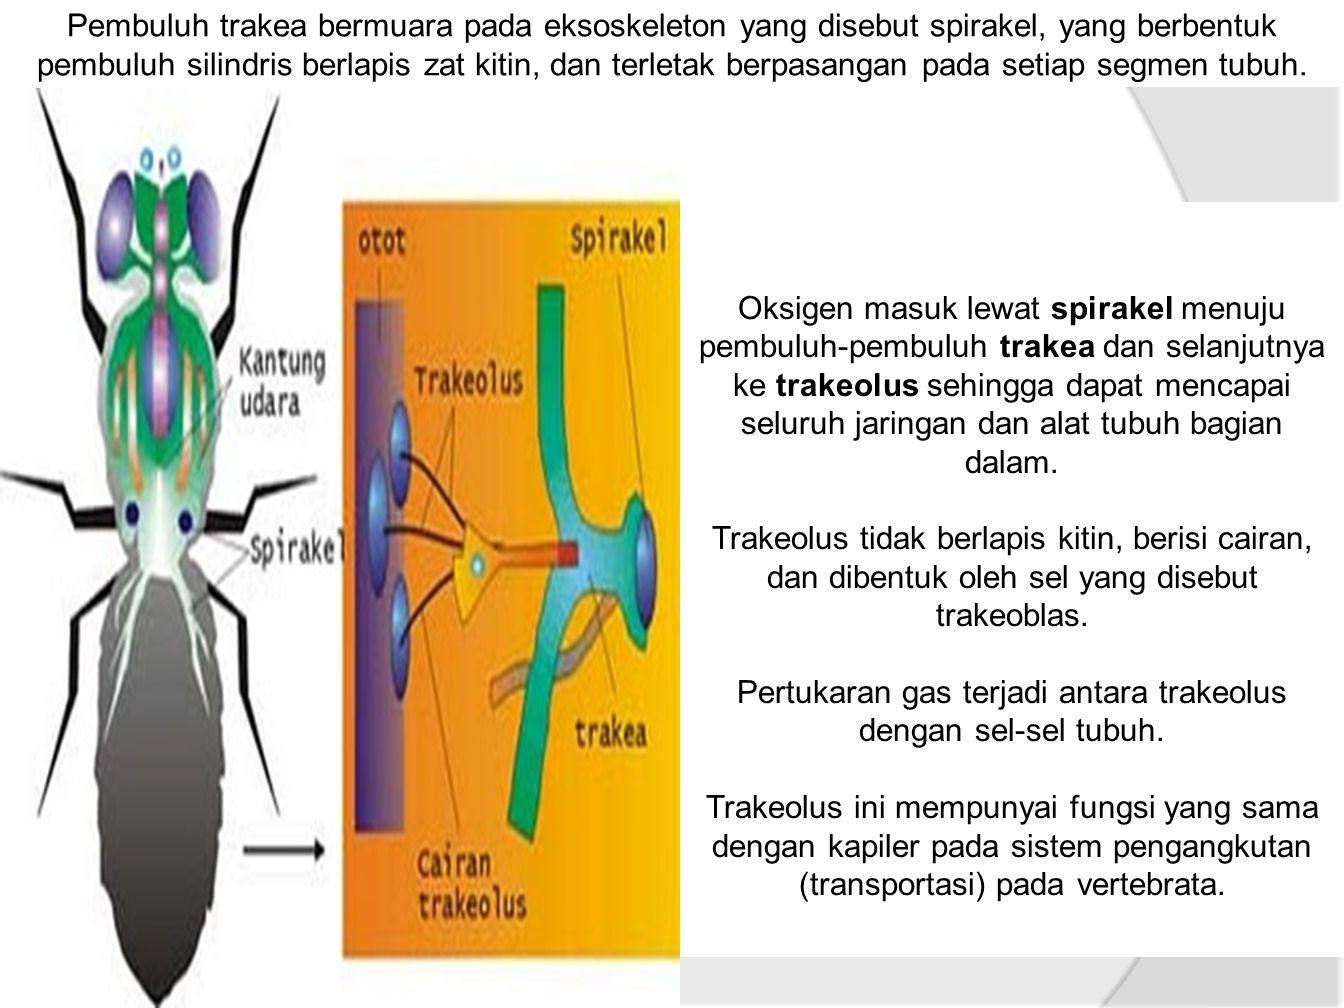 Pertukaran gas terjadi antara trakeolus dengan sel-sel tubuh.